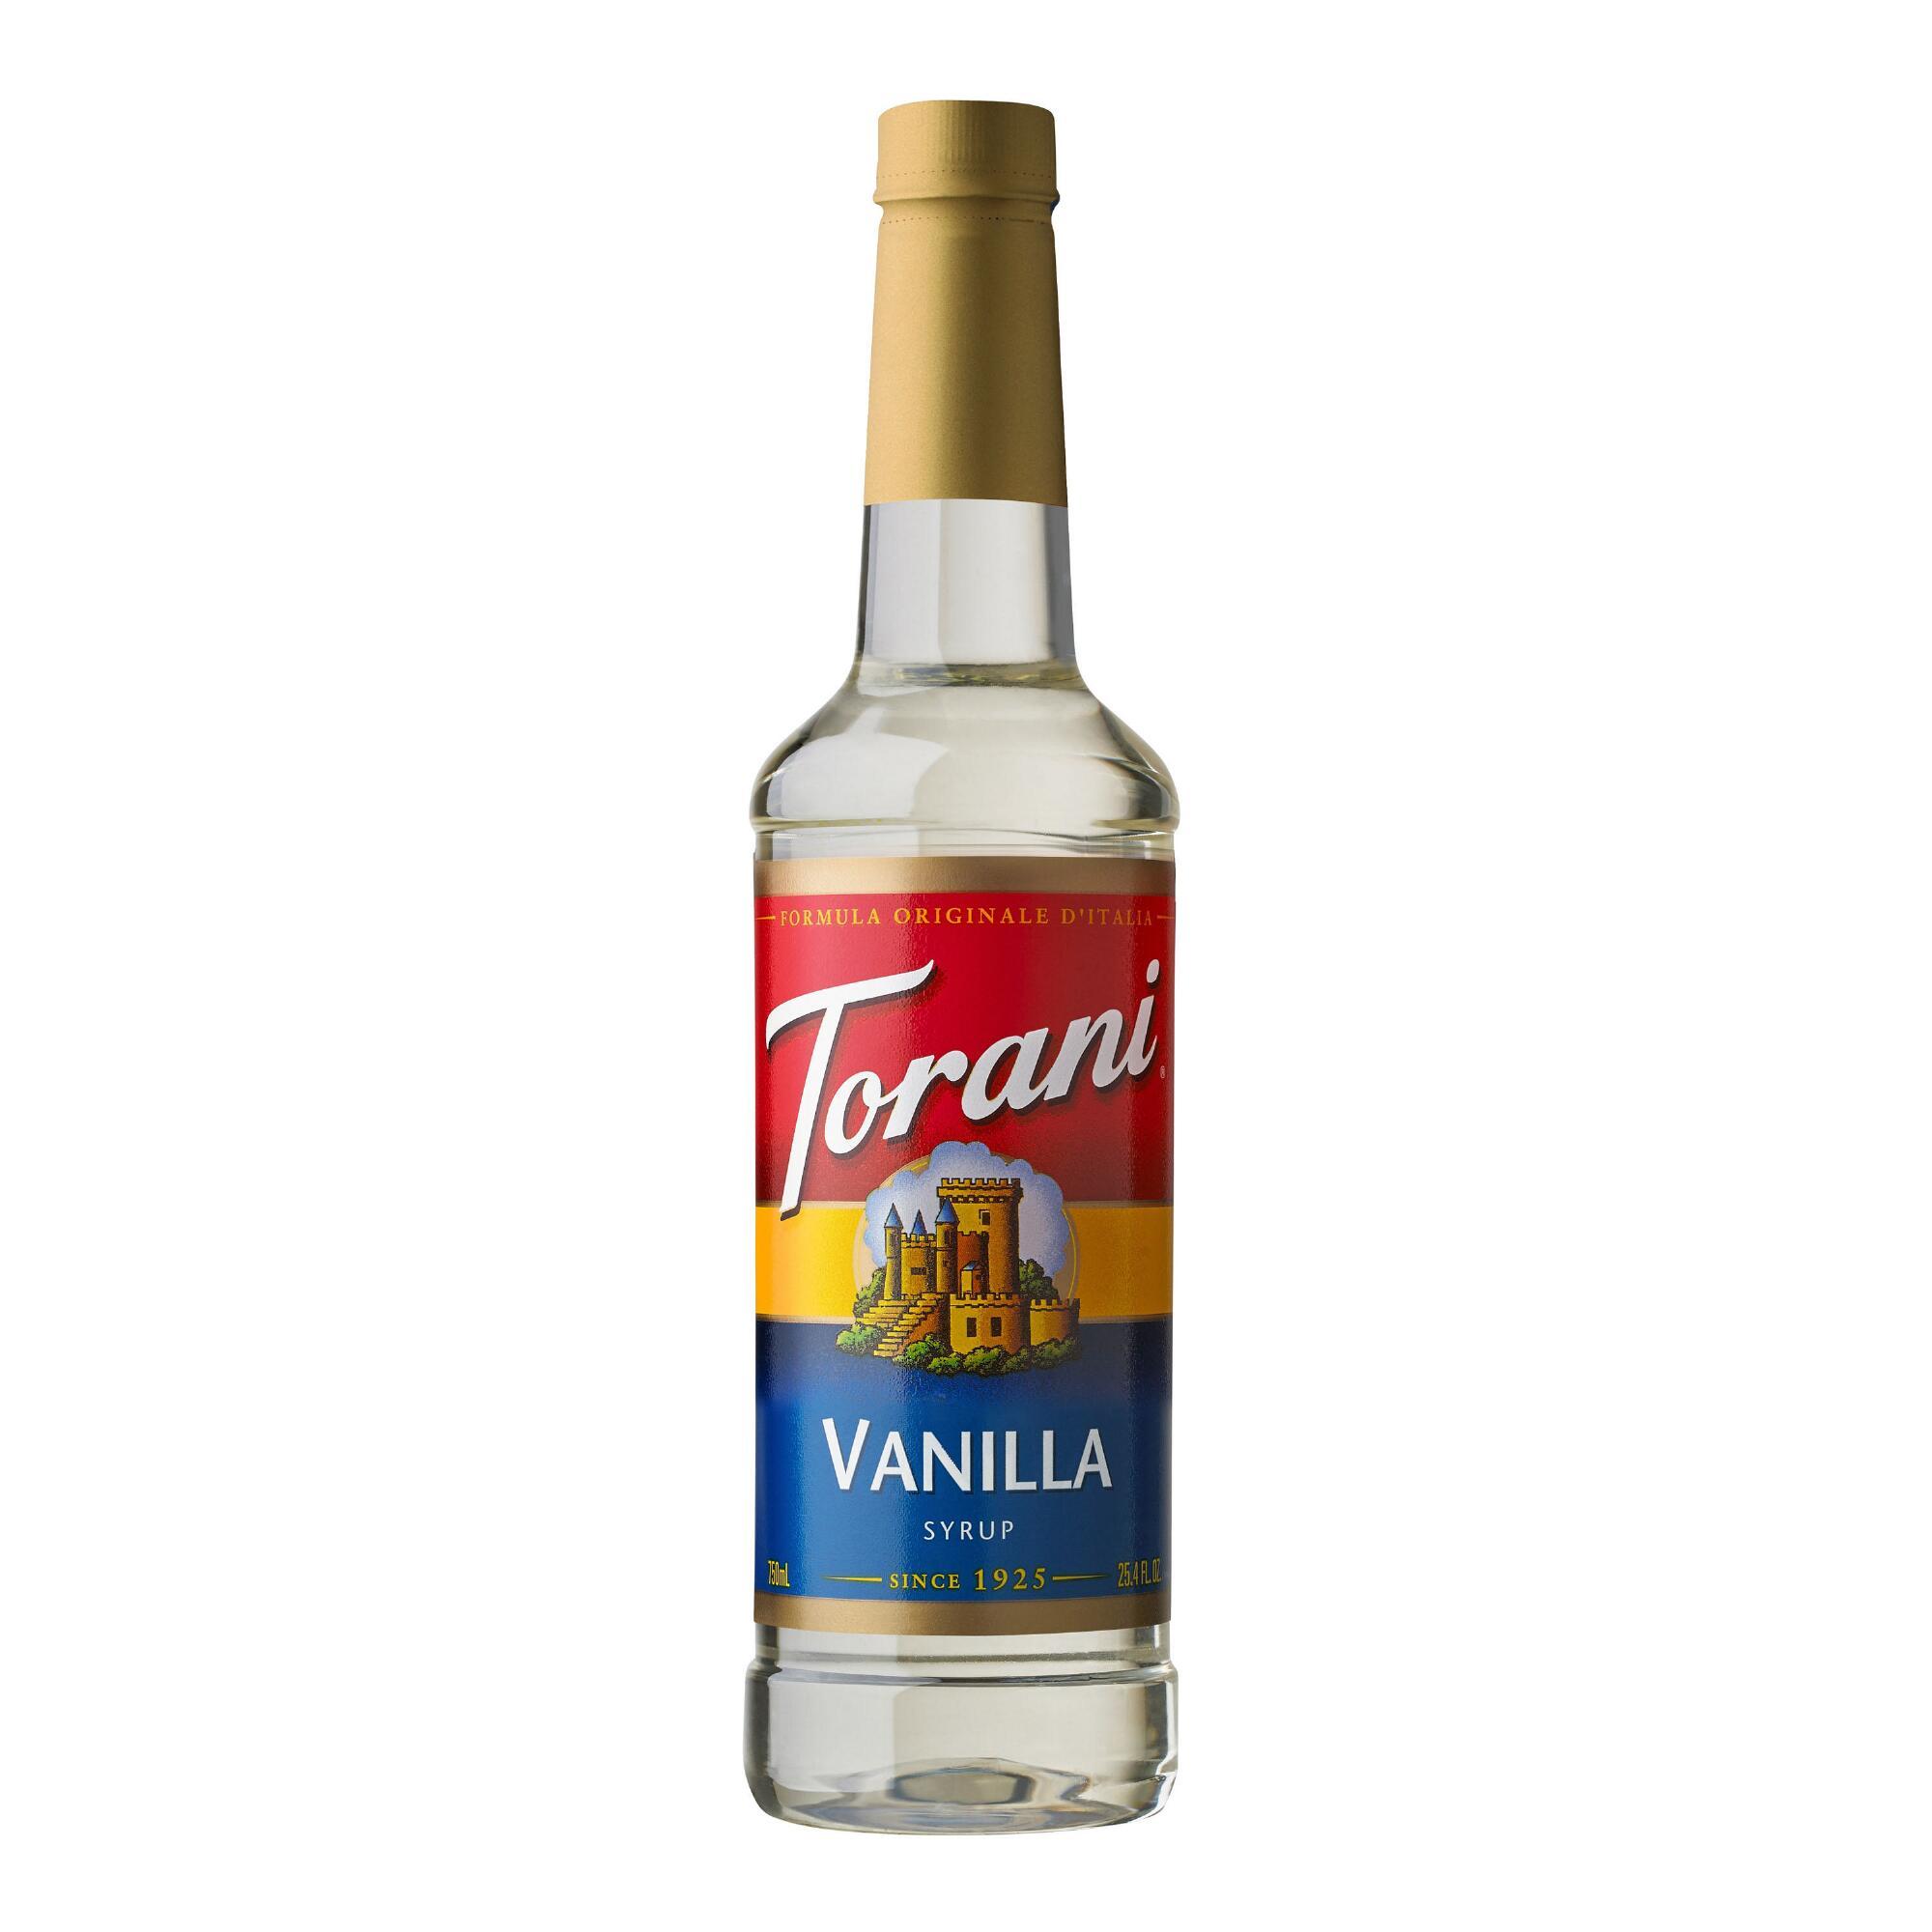 Torani Vanilla Syrup (25.4 fl oz/750 mL) Set Of 4 $12.14